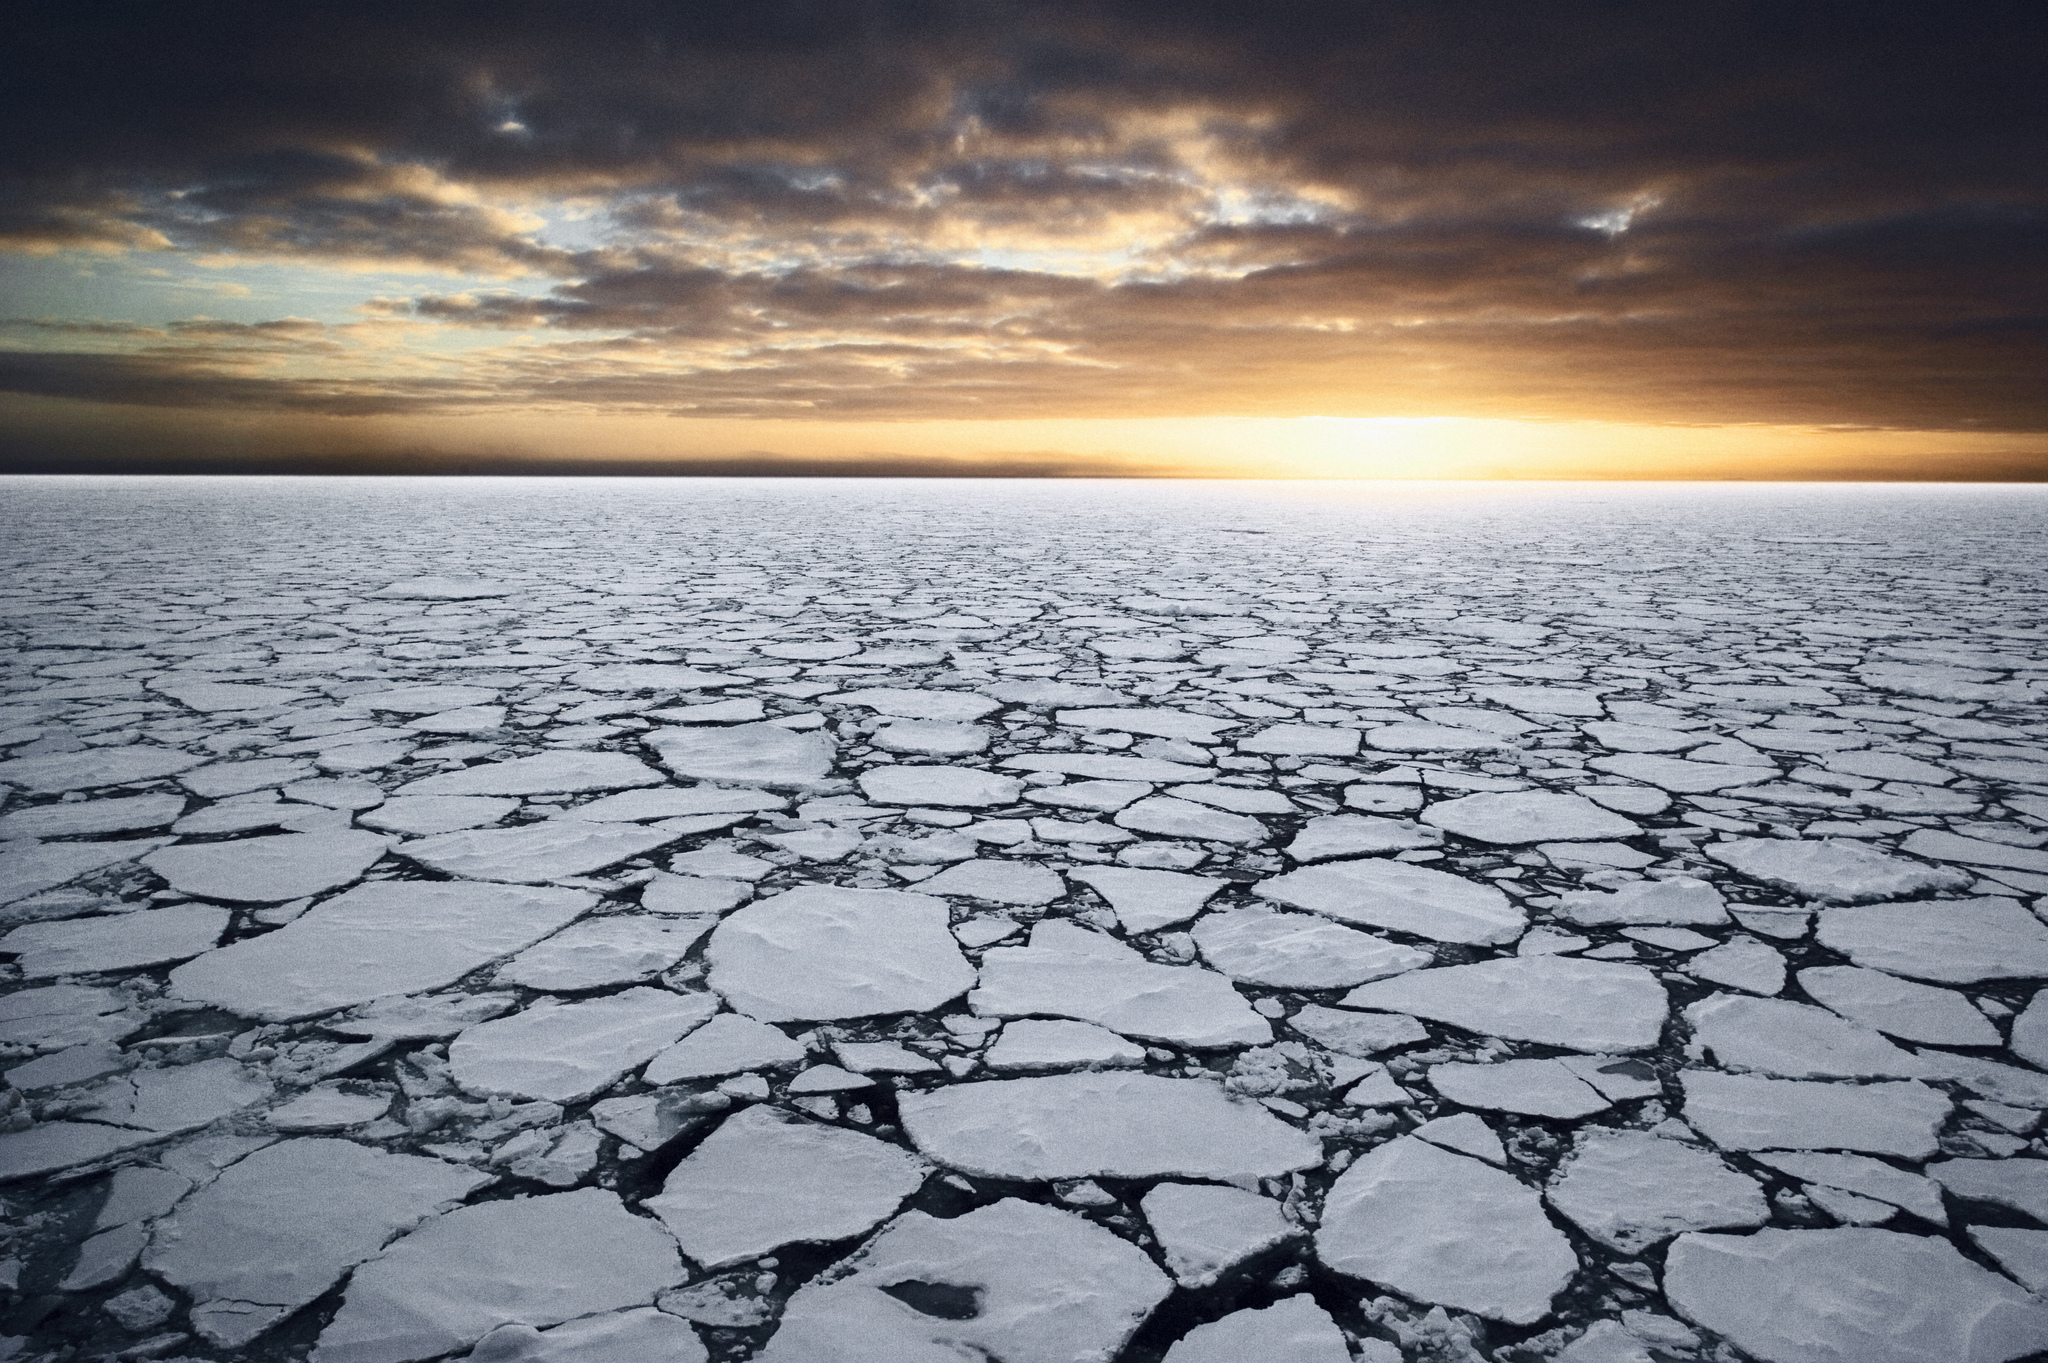 Ice in the Ross Sea, Antarctica